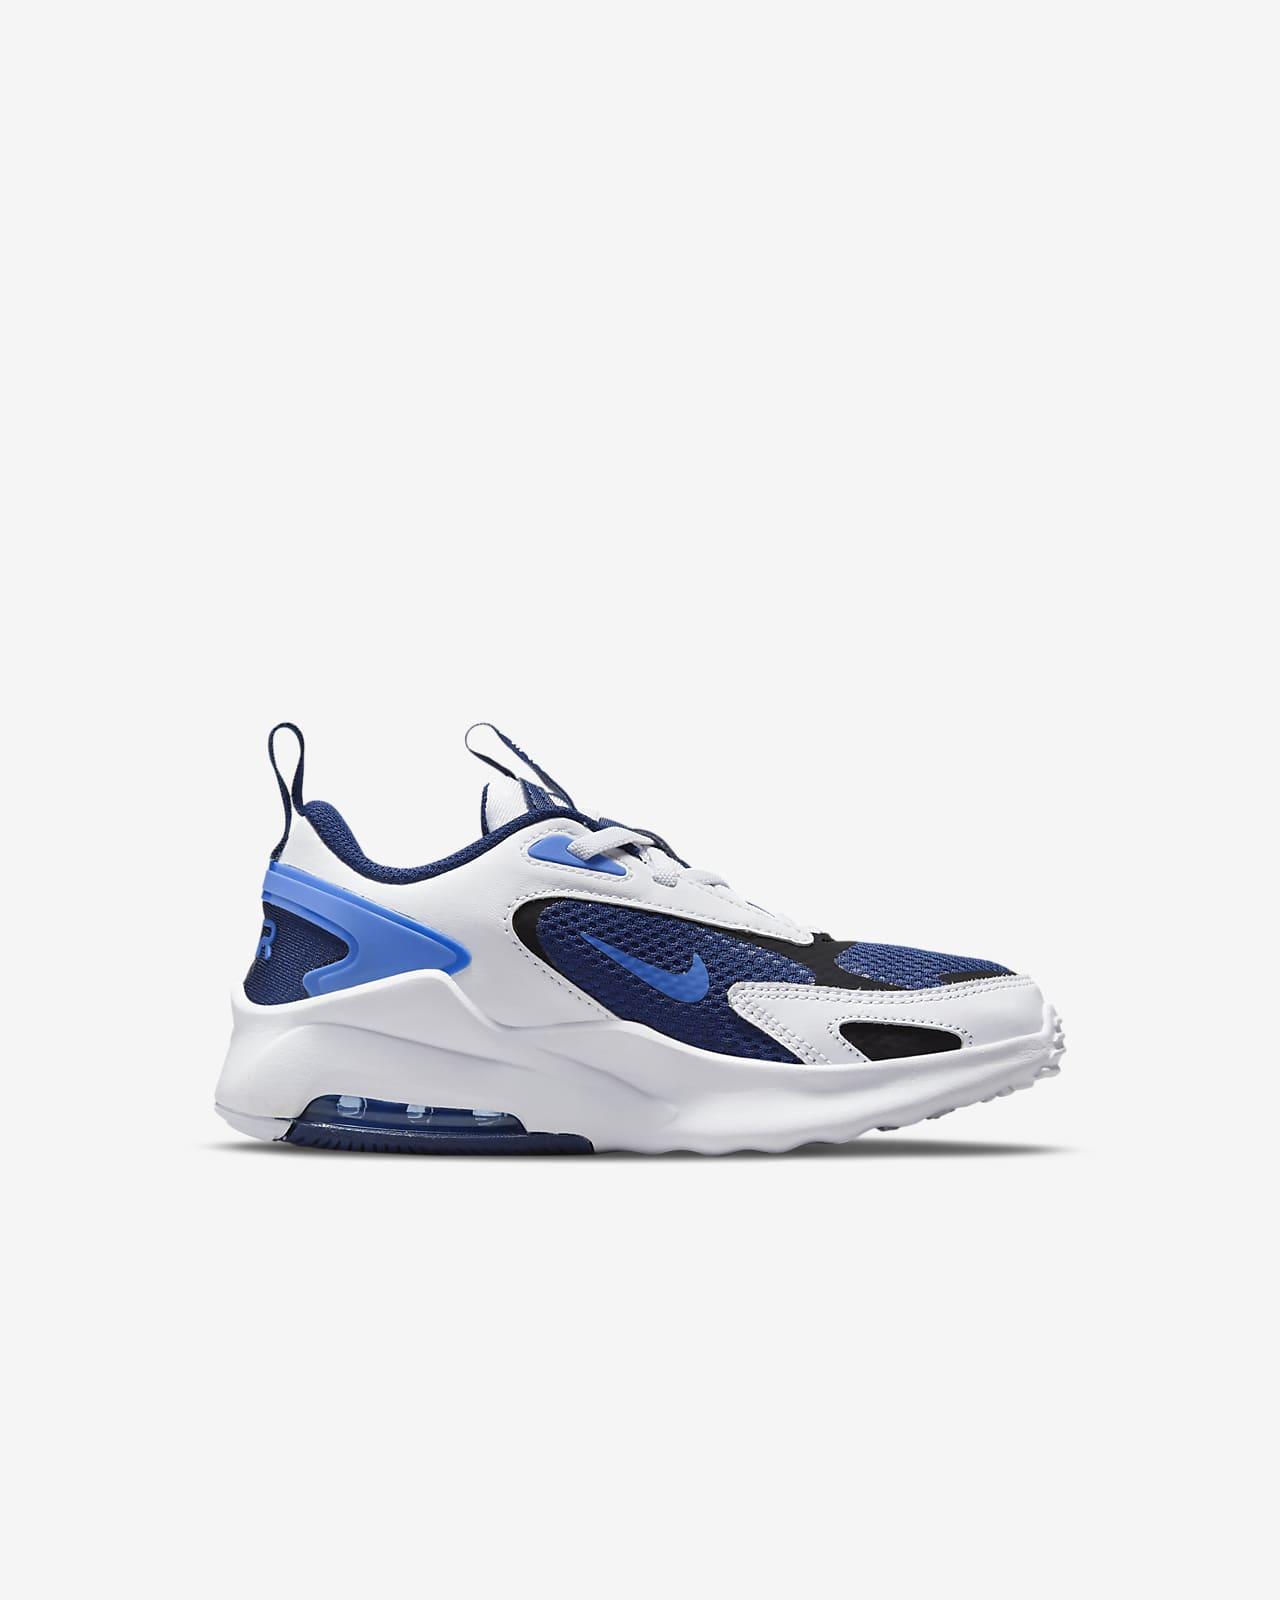 Chaussure Nike Air Max Bolt pour Jeune enfant. Nike LU